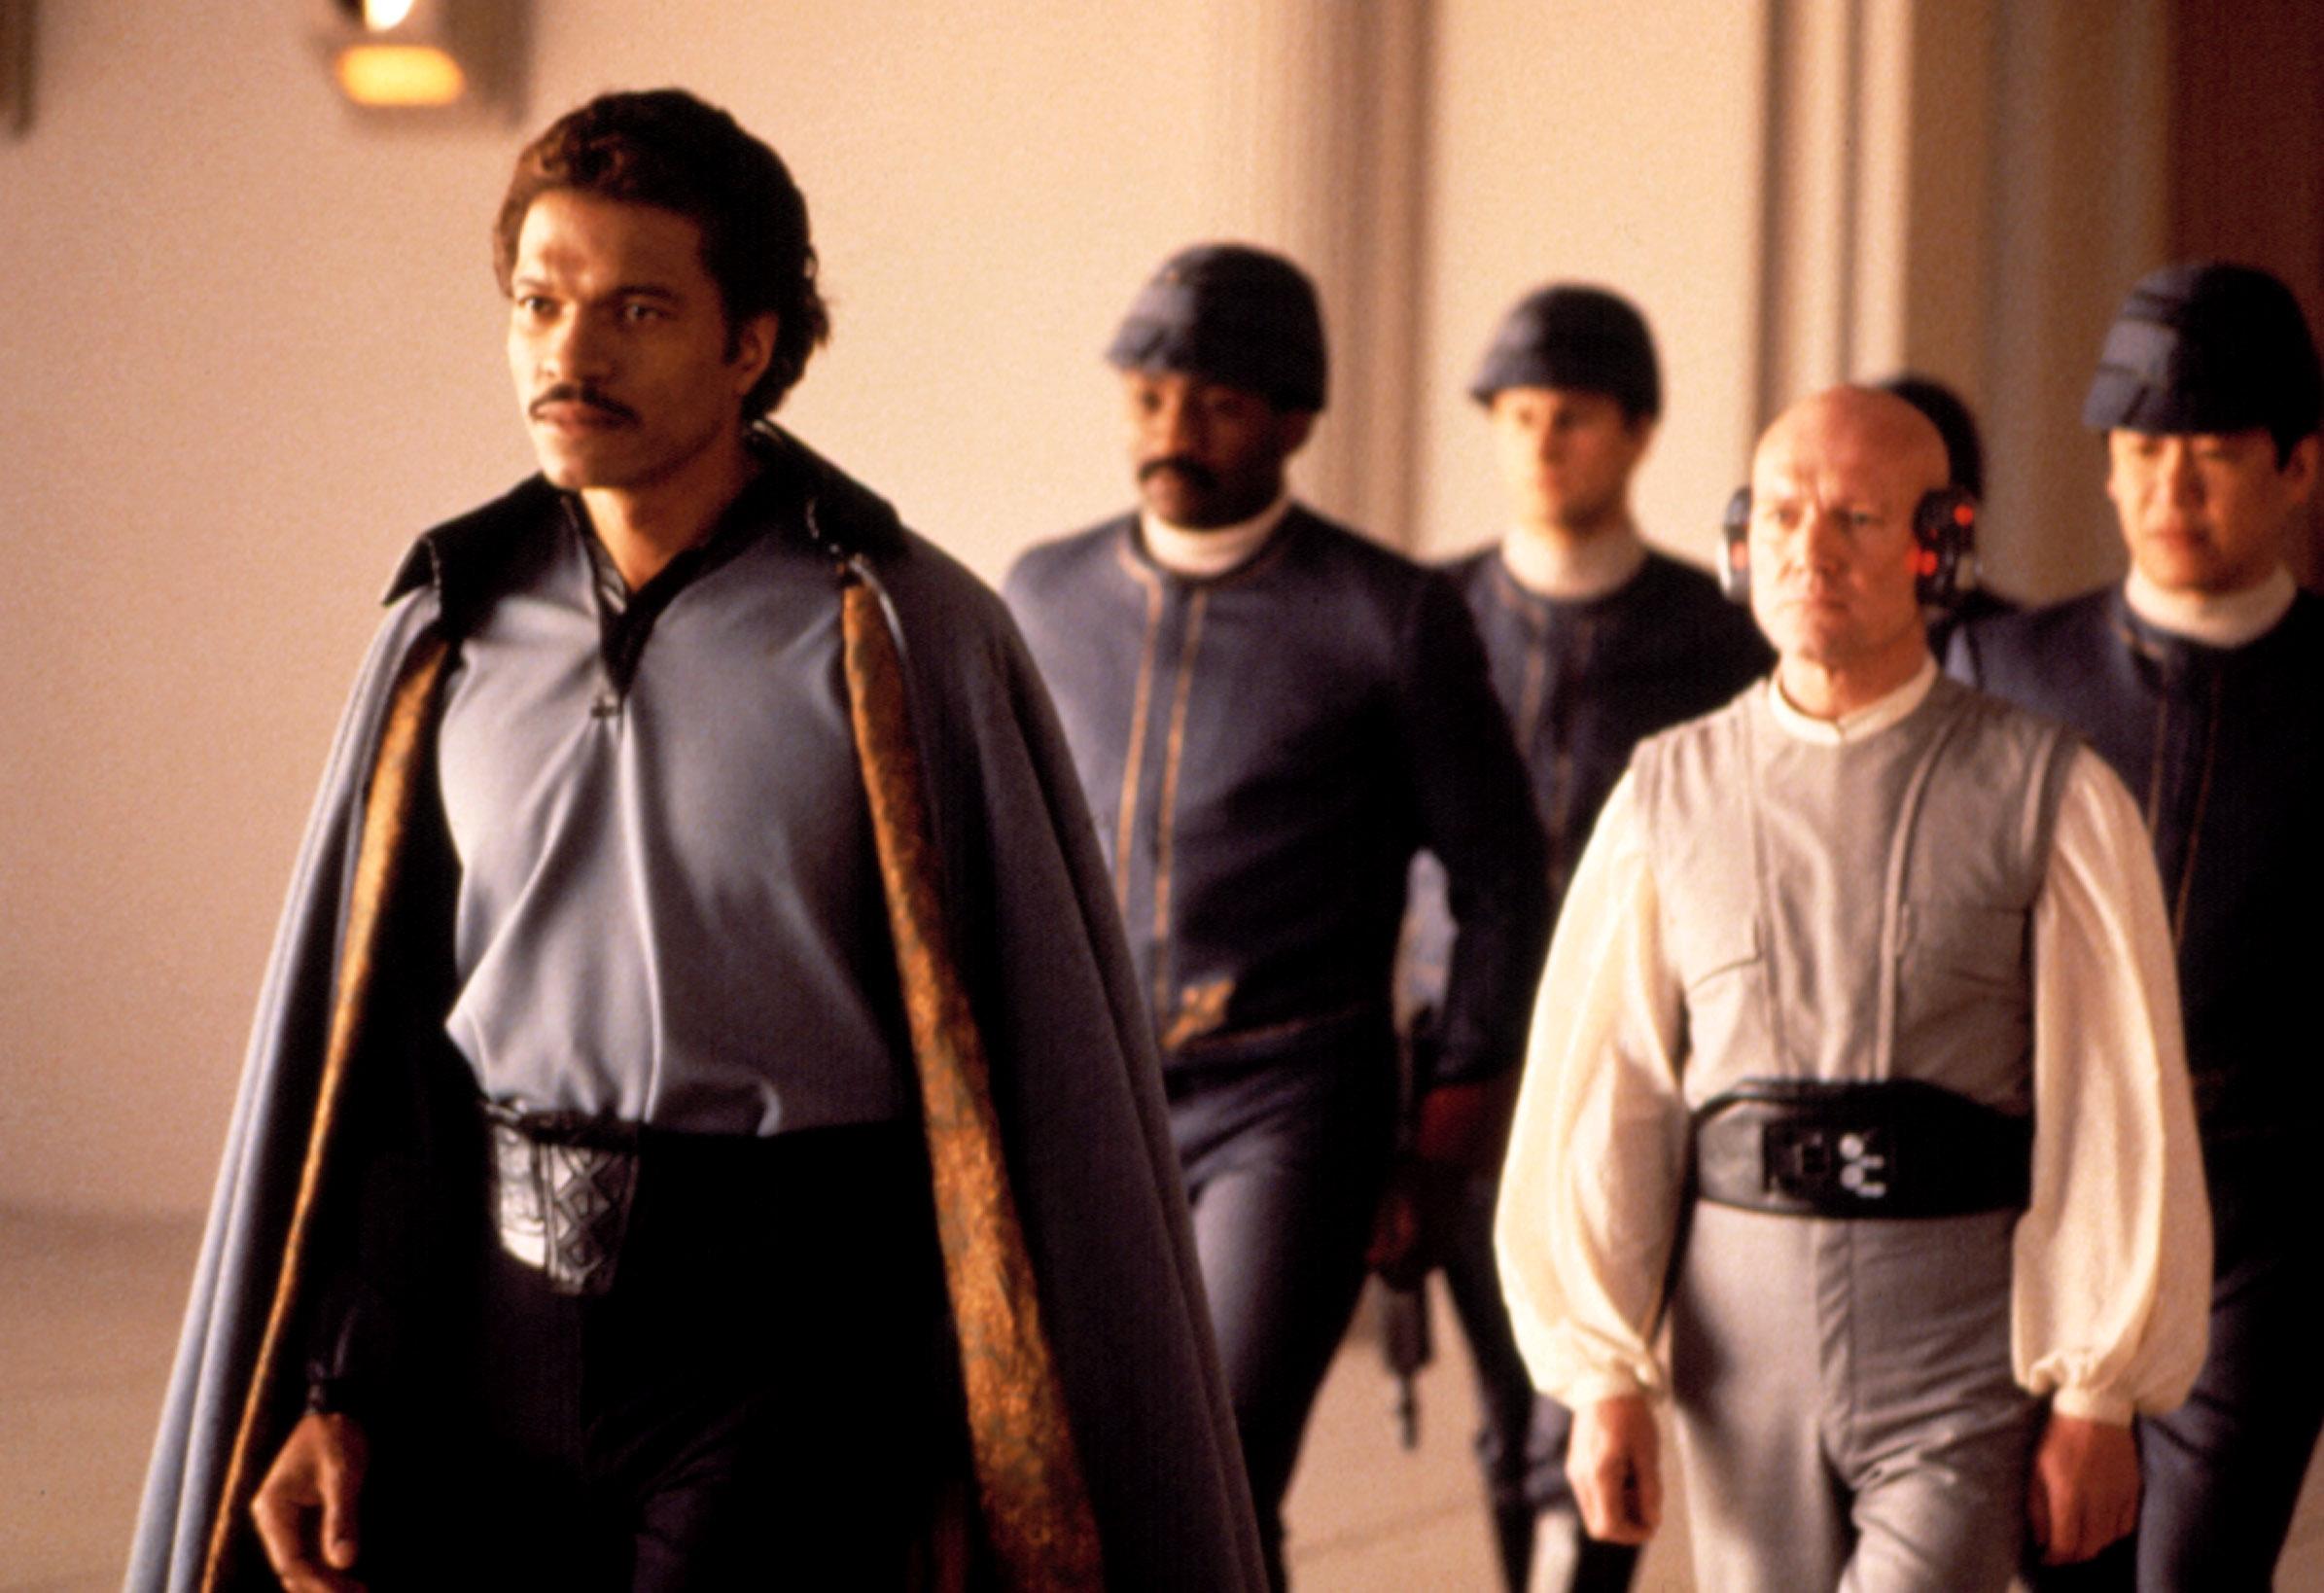 Billy Dee Wiliams Lando Calrissian Star Wars: The Empire Strikes Back